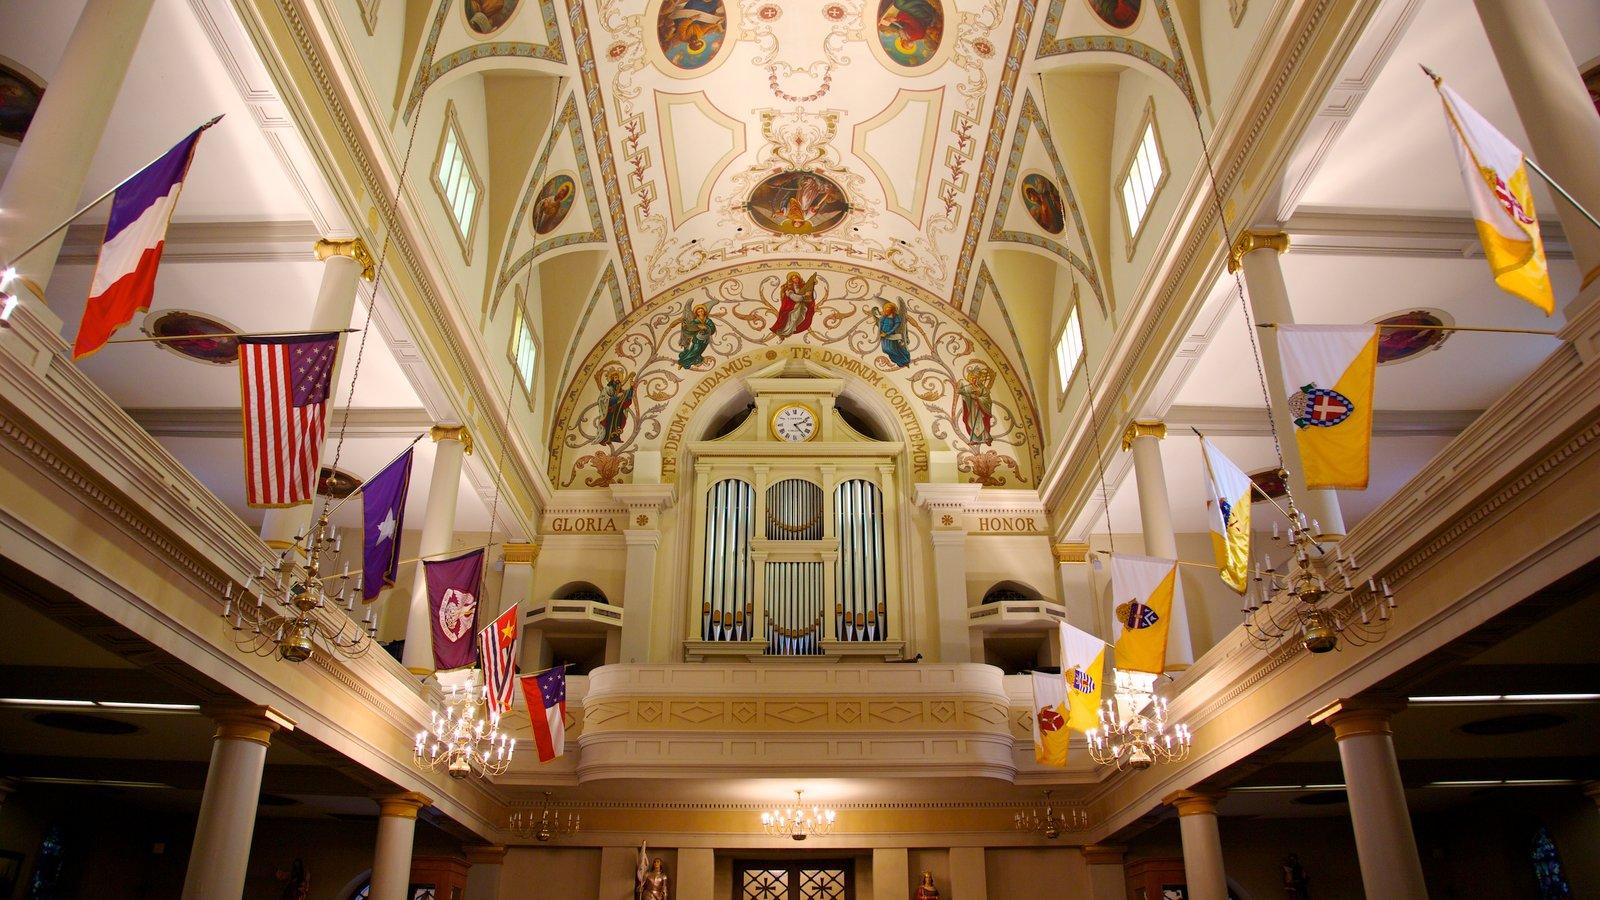 Saint Louis Cathedral caracterizando uma igreja ou catedral, vistas internas e aspectos religiosos